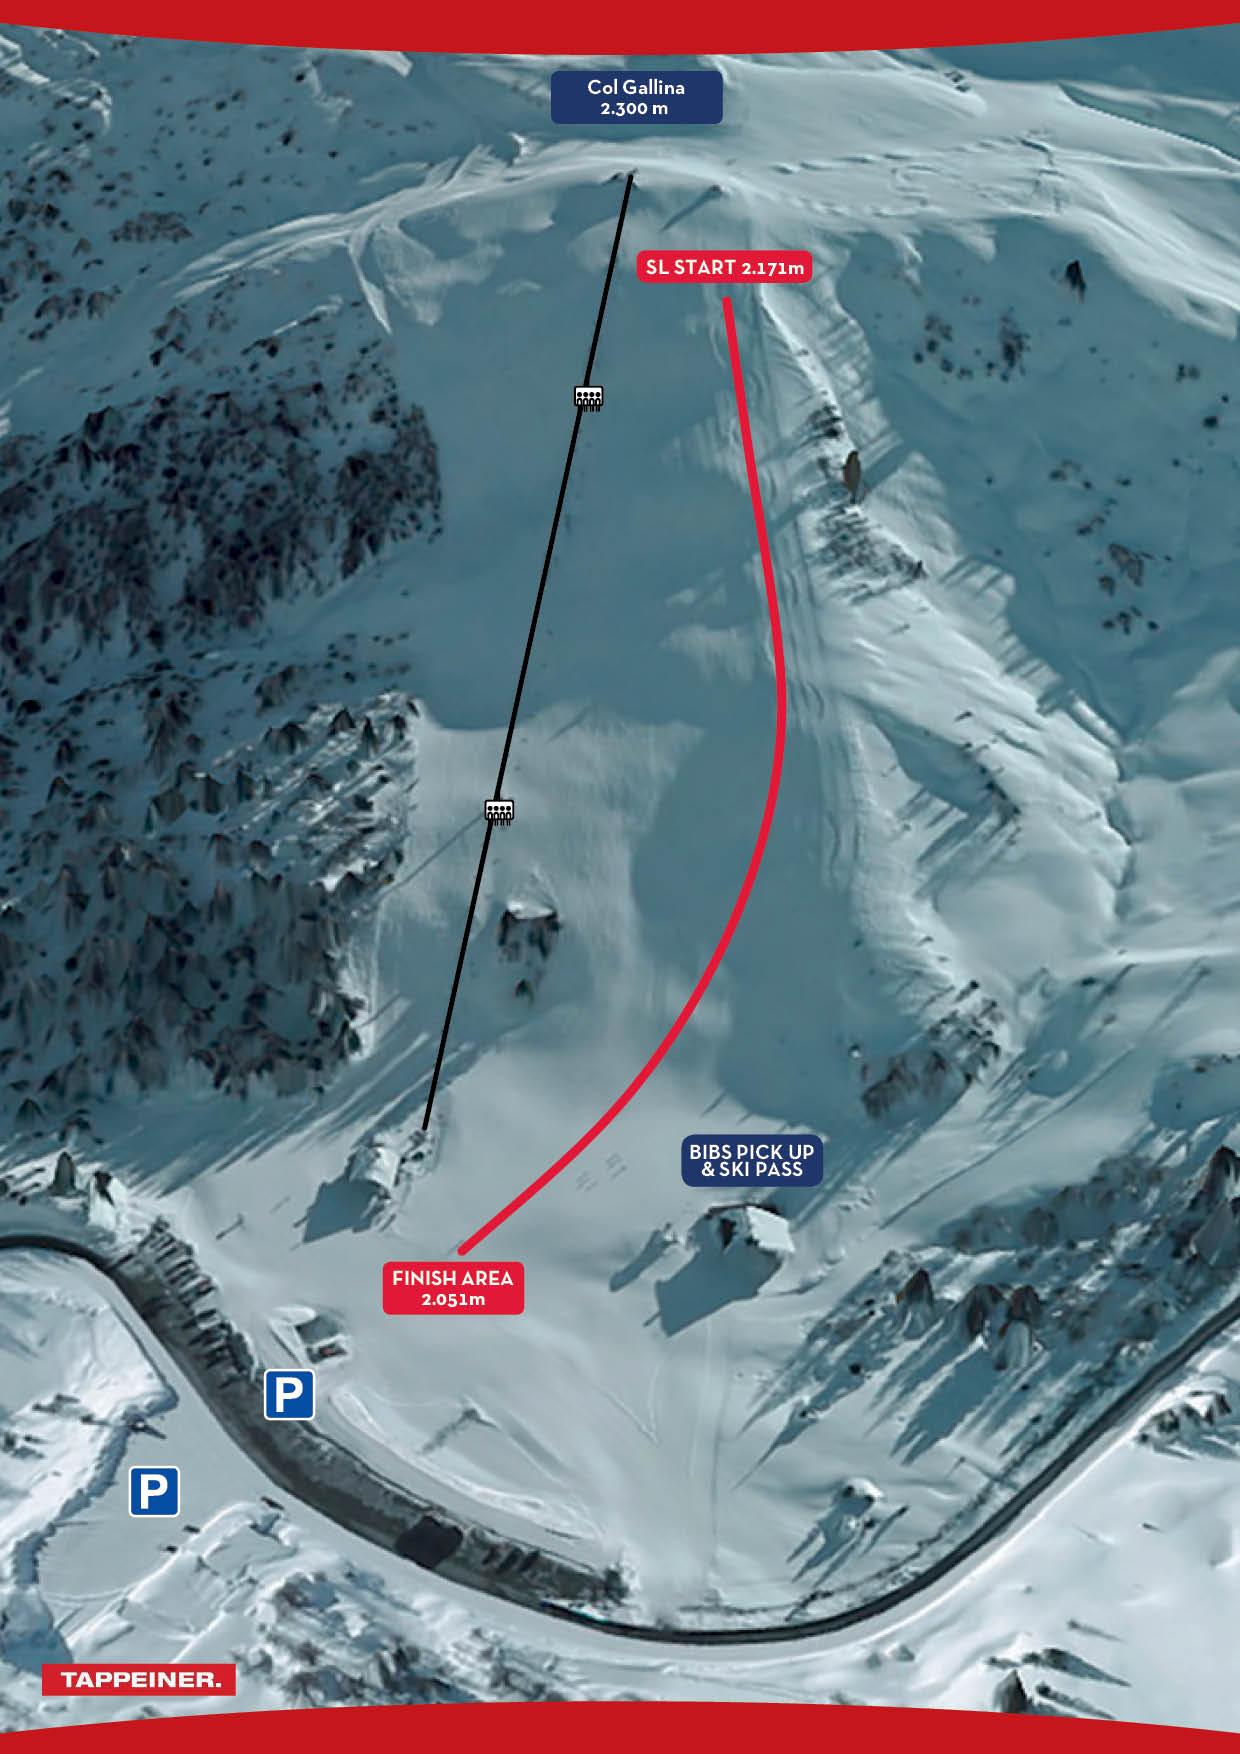 Pista Col Gallina al Passo Falzarego